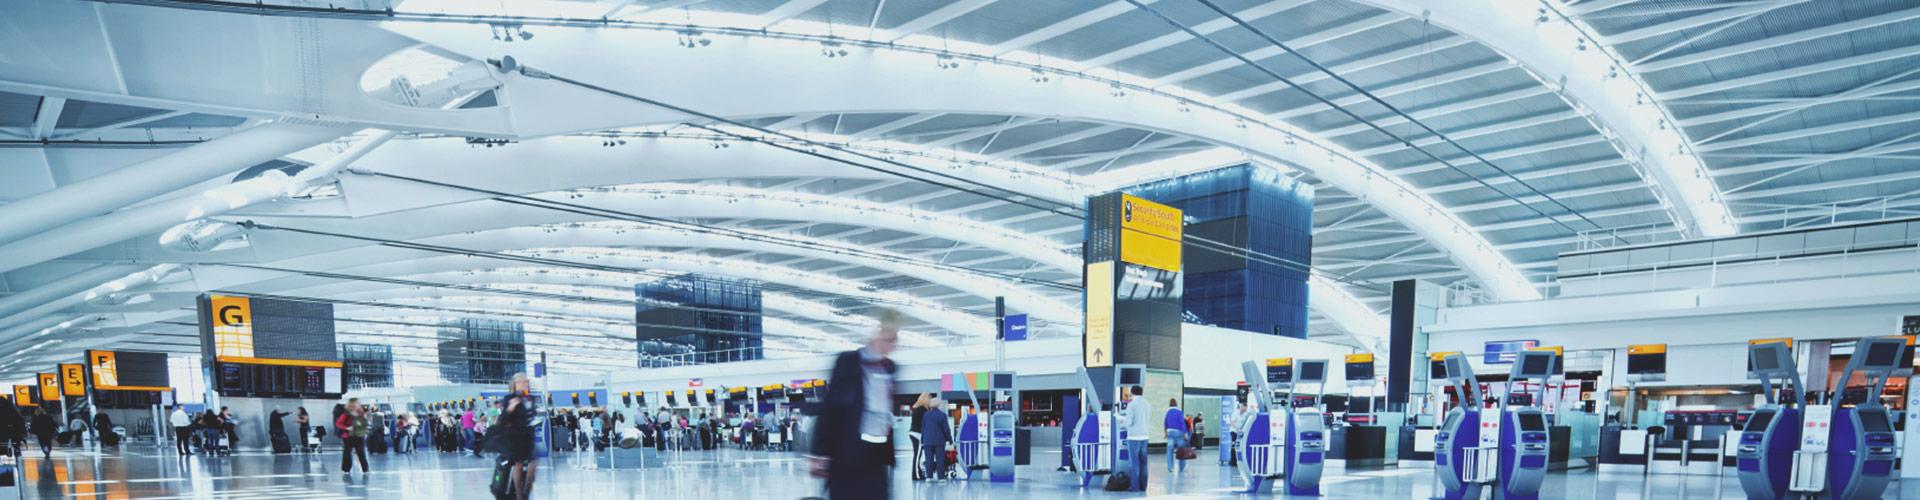 Airport Logistics Rail Systems